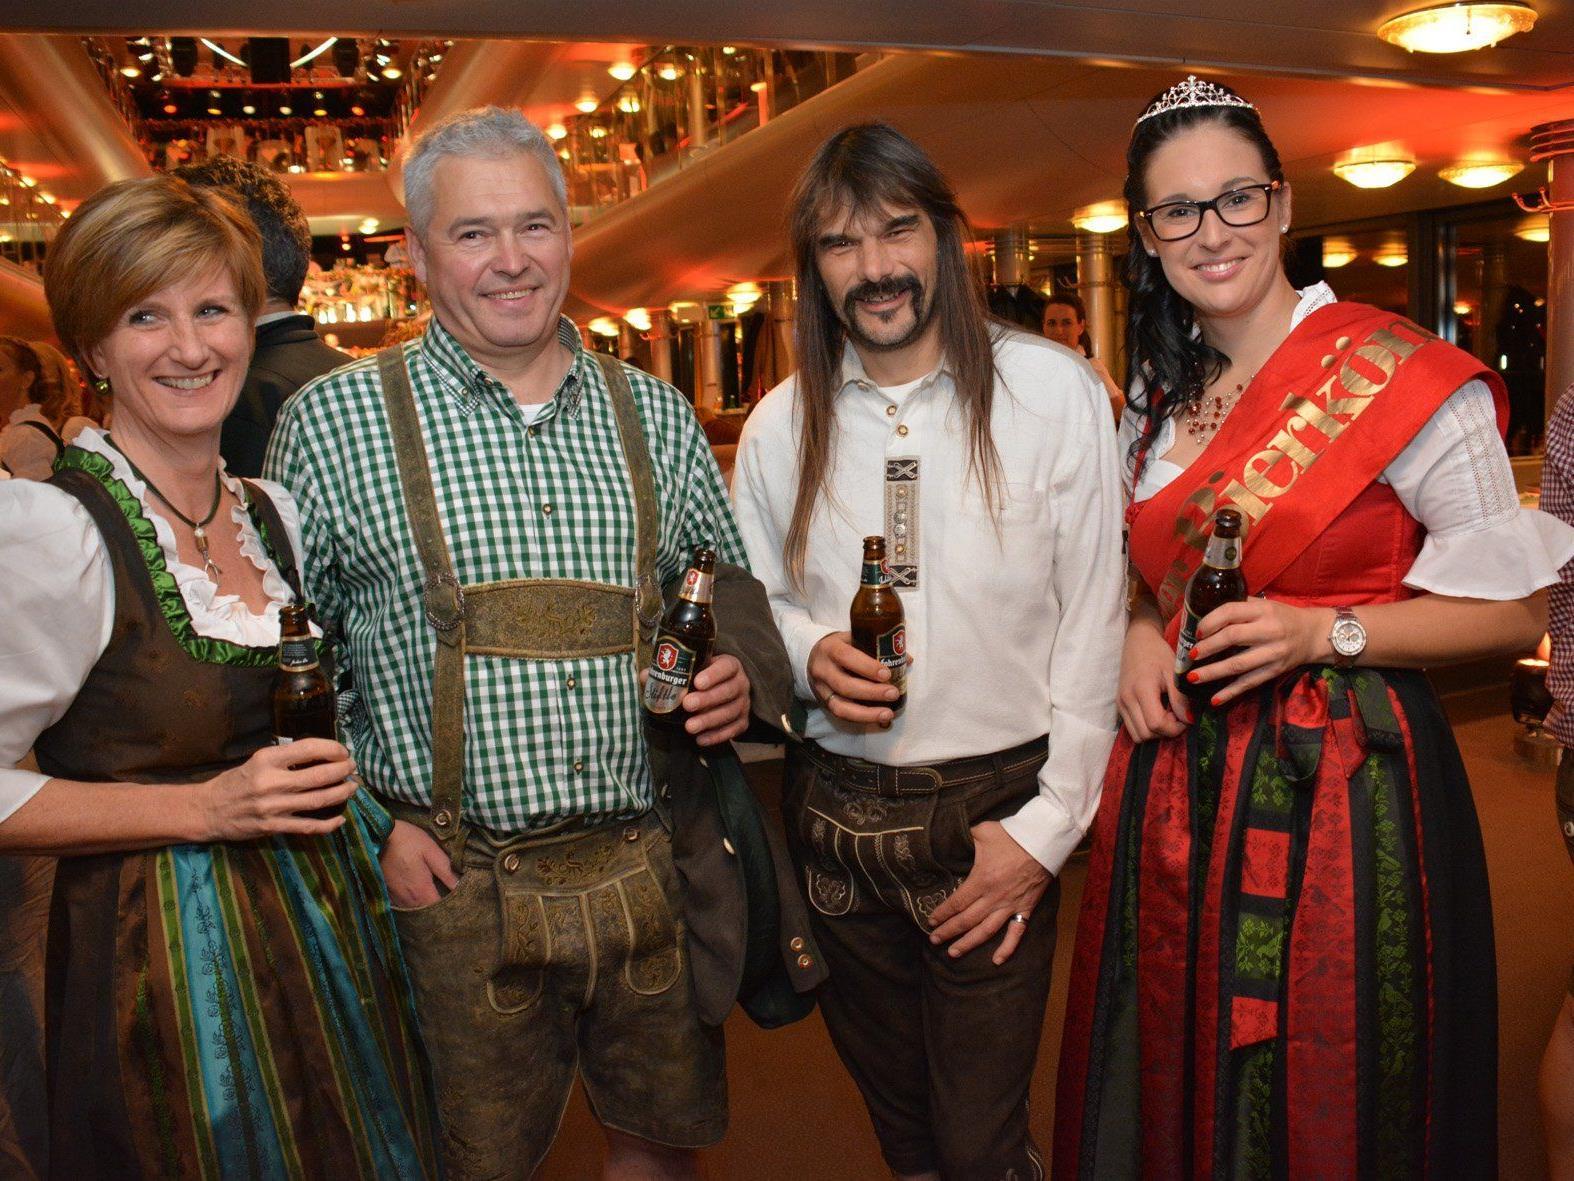 Sabine Treimel, Andreas Rosa, Wolfgang Sila und Bierkönigin Raphaela Dünser als Bierbotschafter.